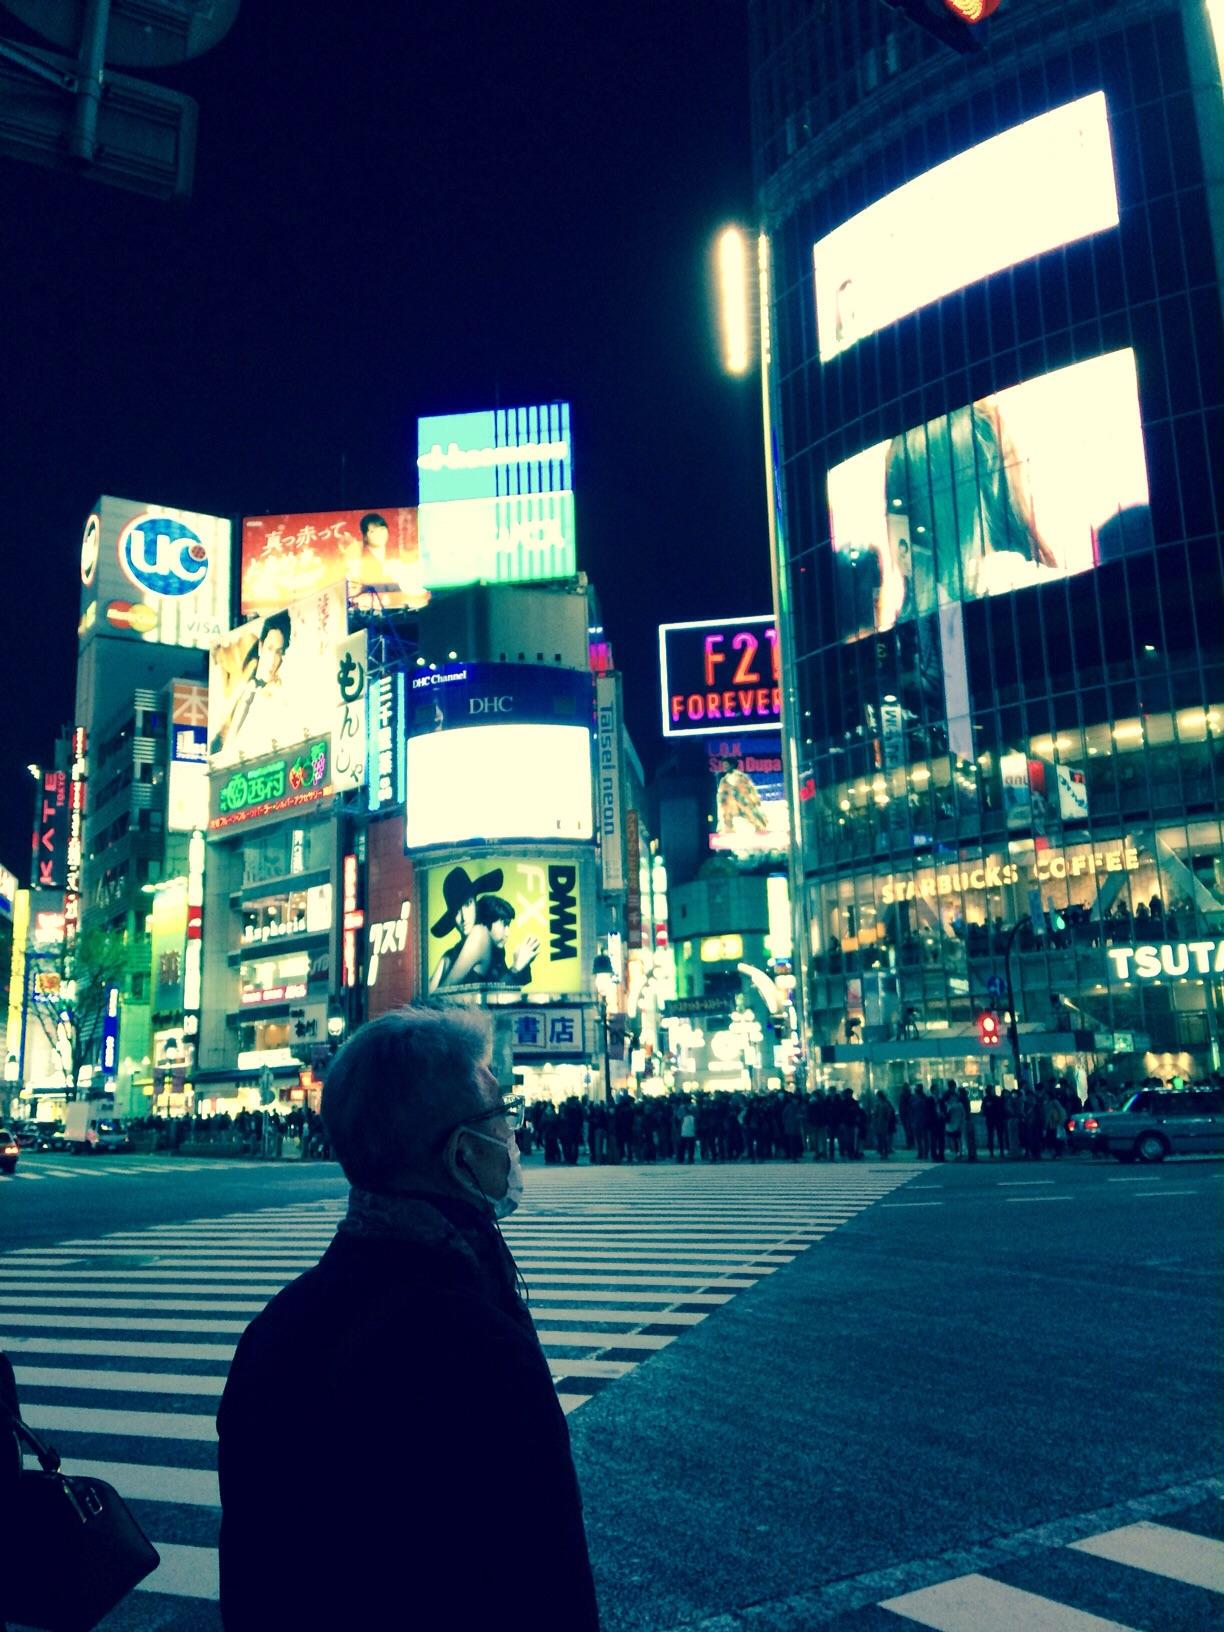 Preparing to cross: Shibuya